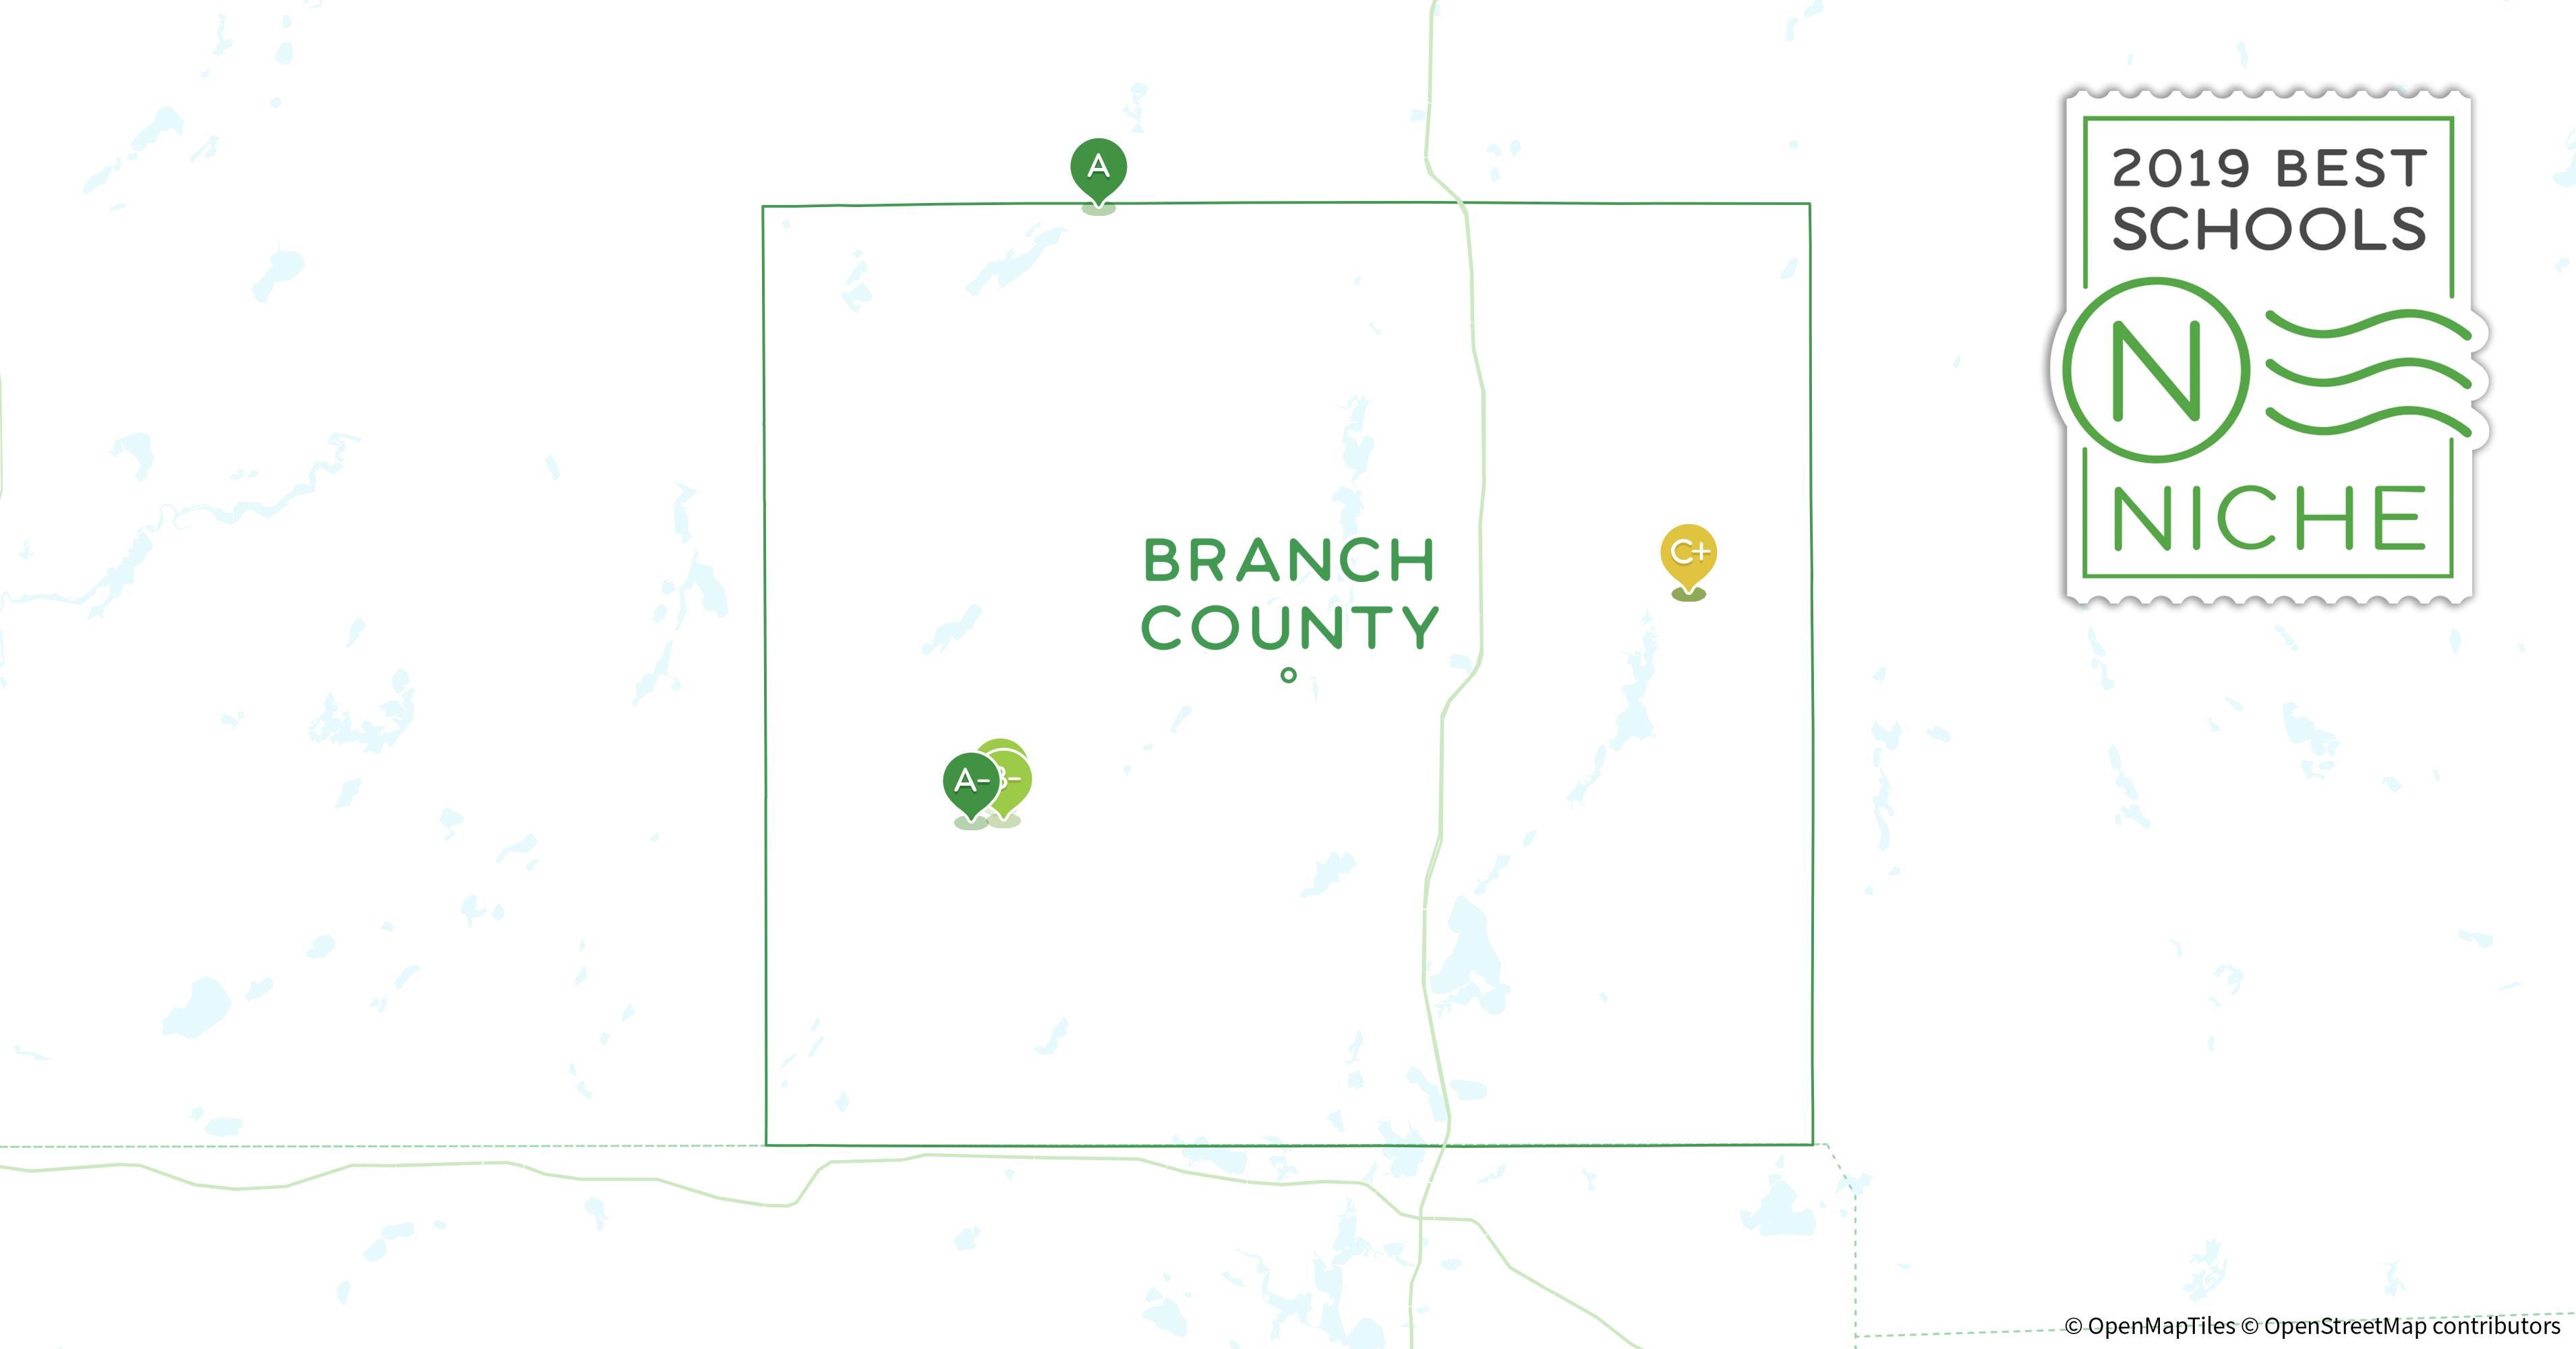 School Districts In Branch County Mi Niche